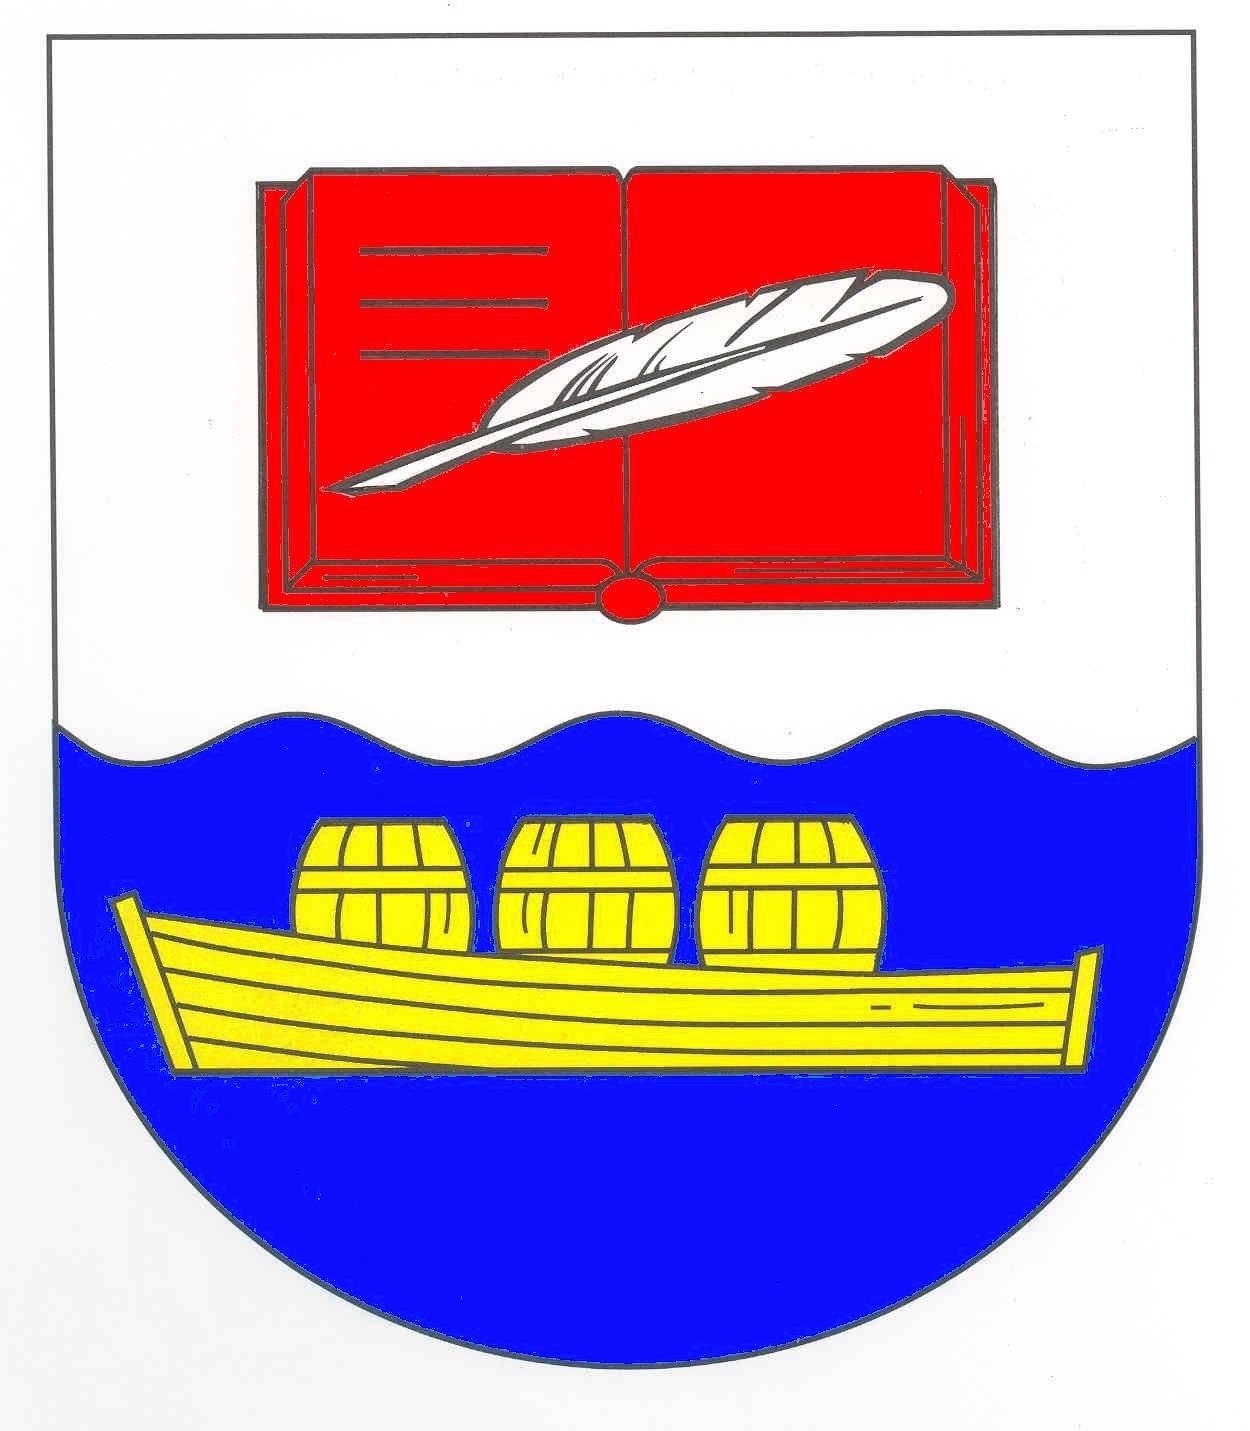 Wappen GemeindeBargfeld-Stegen, Kreis Stormarn